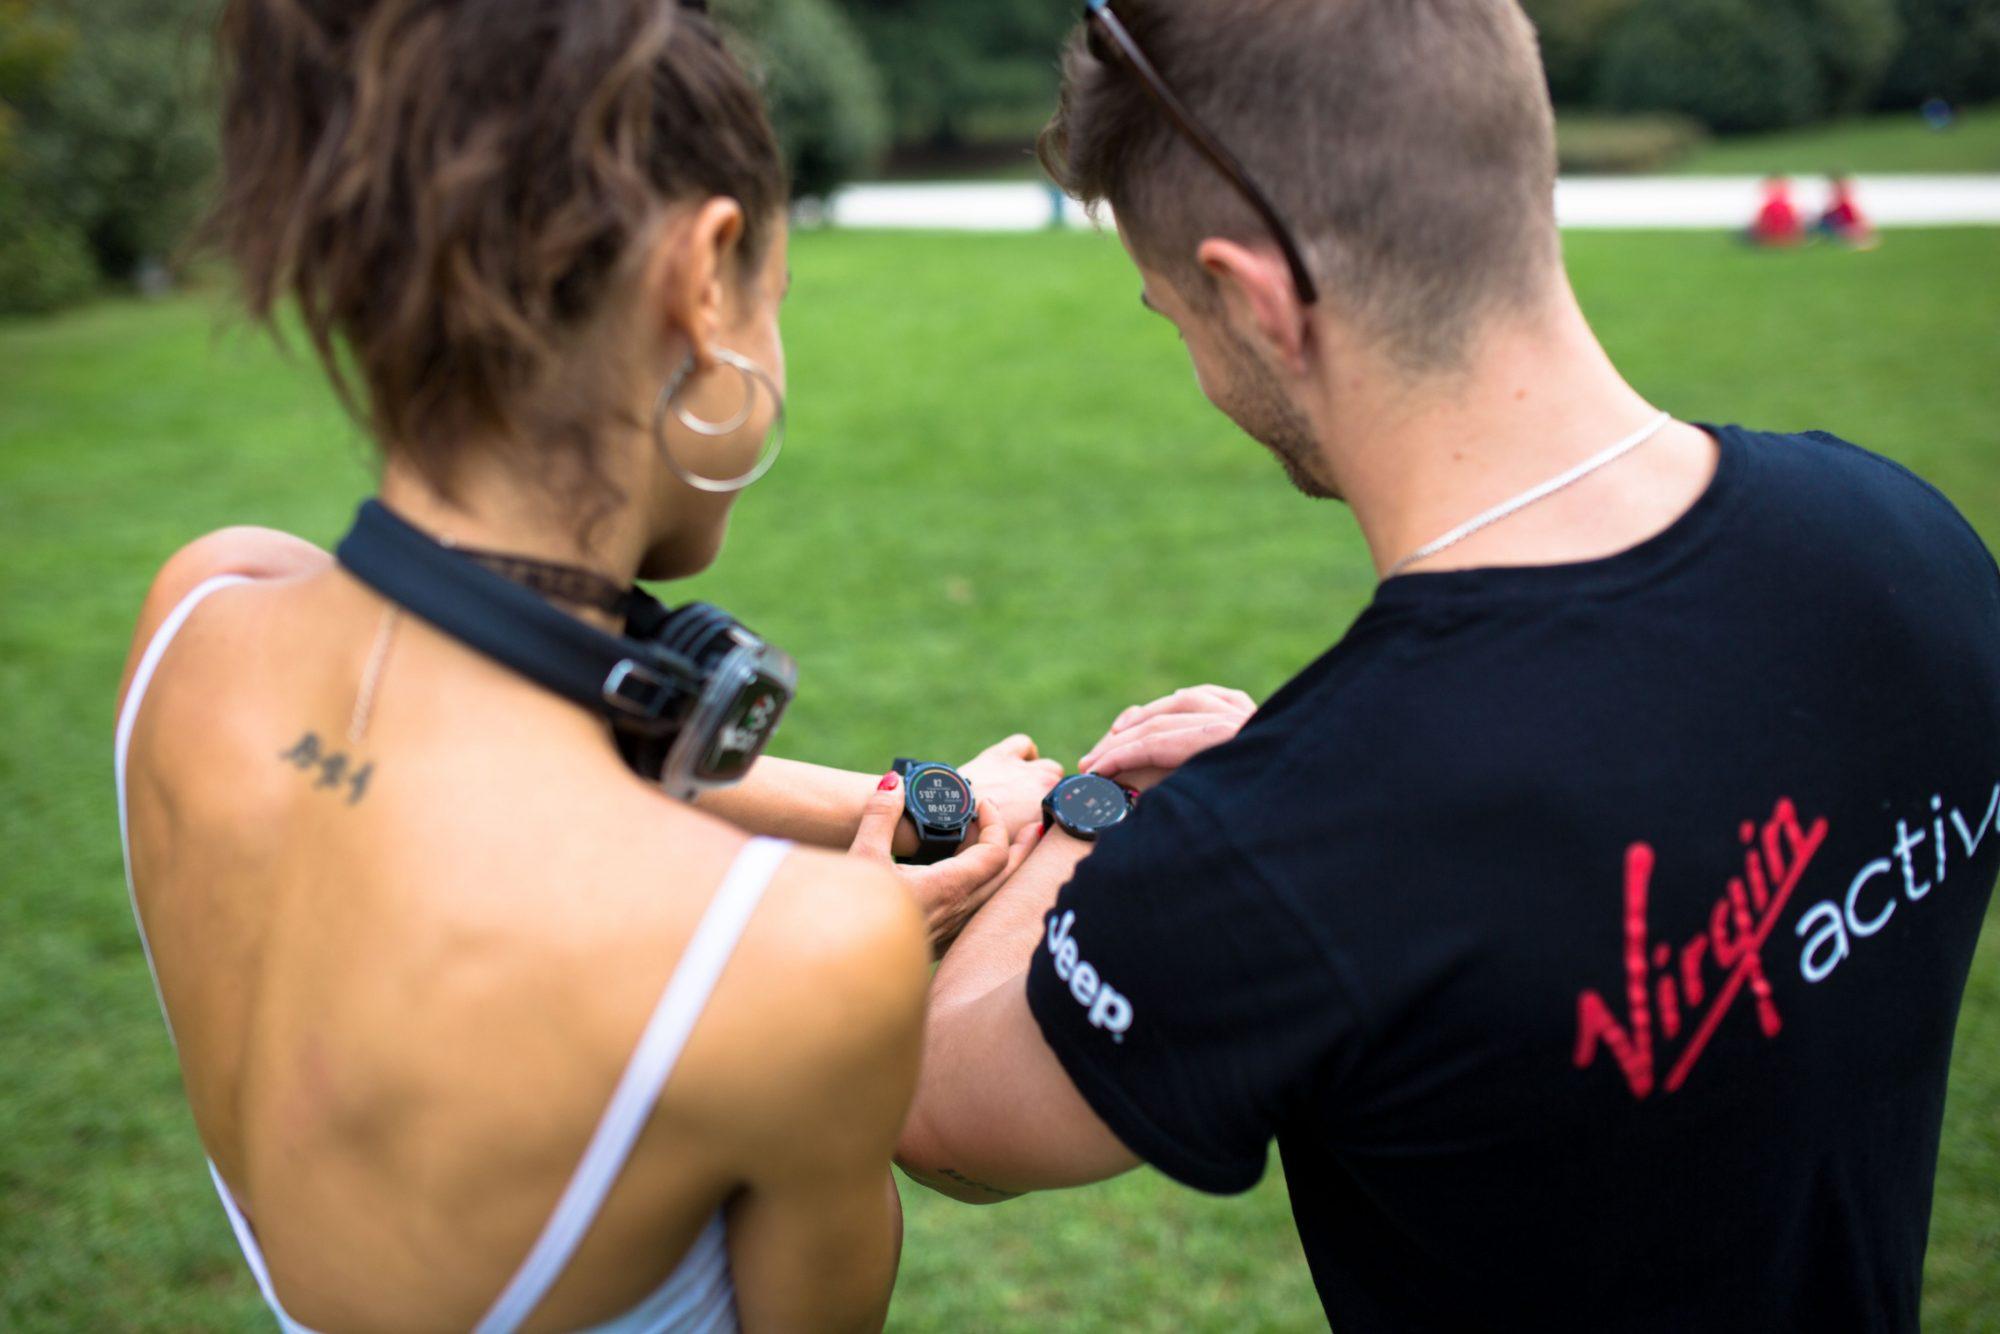 Huawei Watch GT 2 e Virgin Active insieme per una Training Experience thumbnail